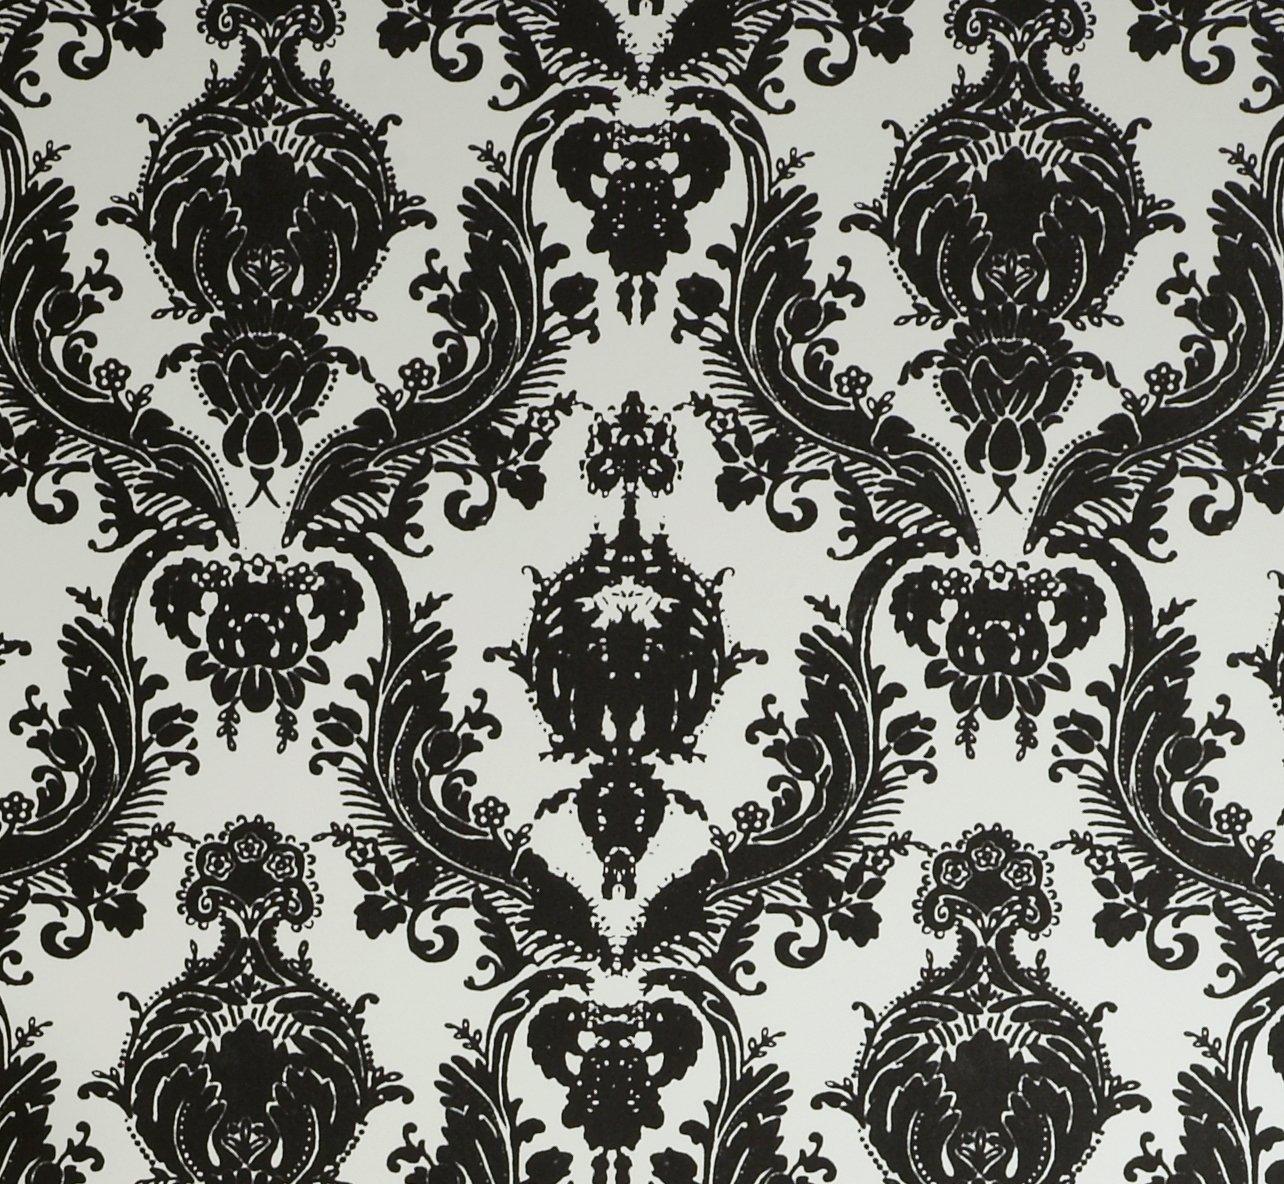 Vintage wallpaper 1 tempaper designs da 005 damsel self adhesive temporary wallpaper white and - Wallpaper 600x600 ...